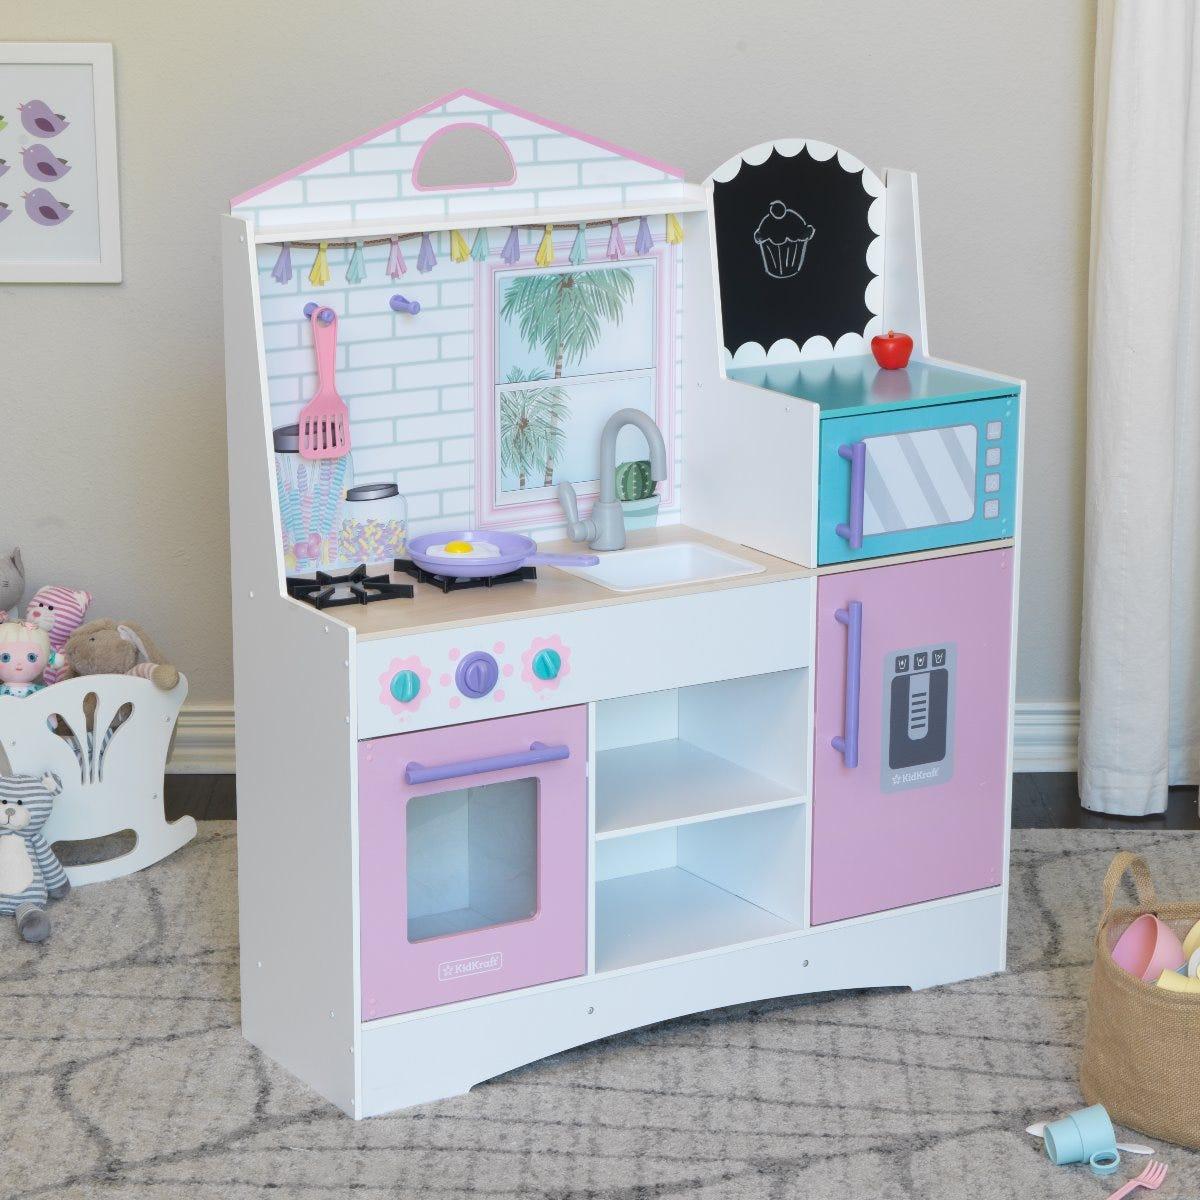 Детска кухня за игра Мечта от KidKraft-bellamiestore